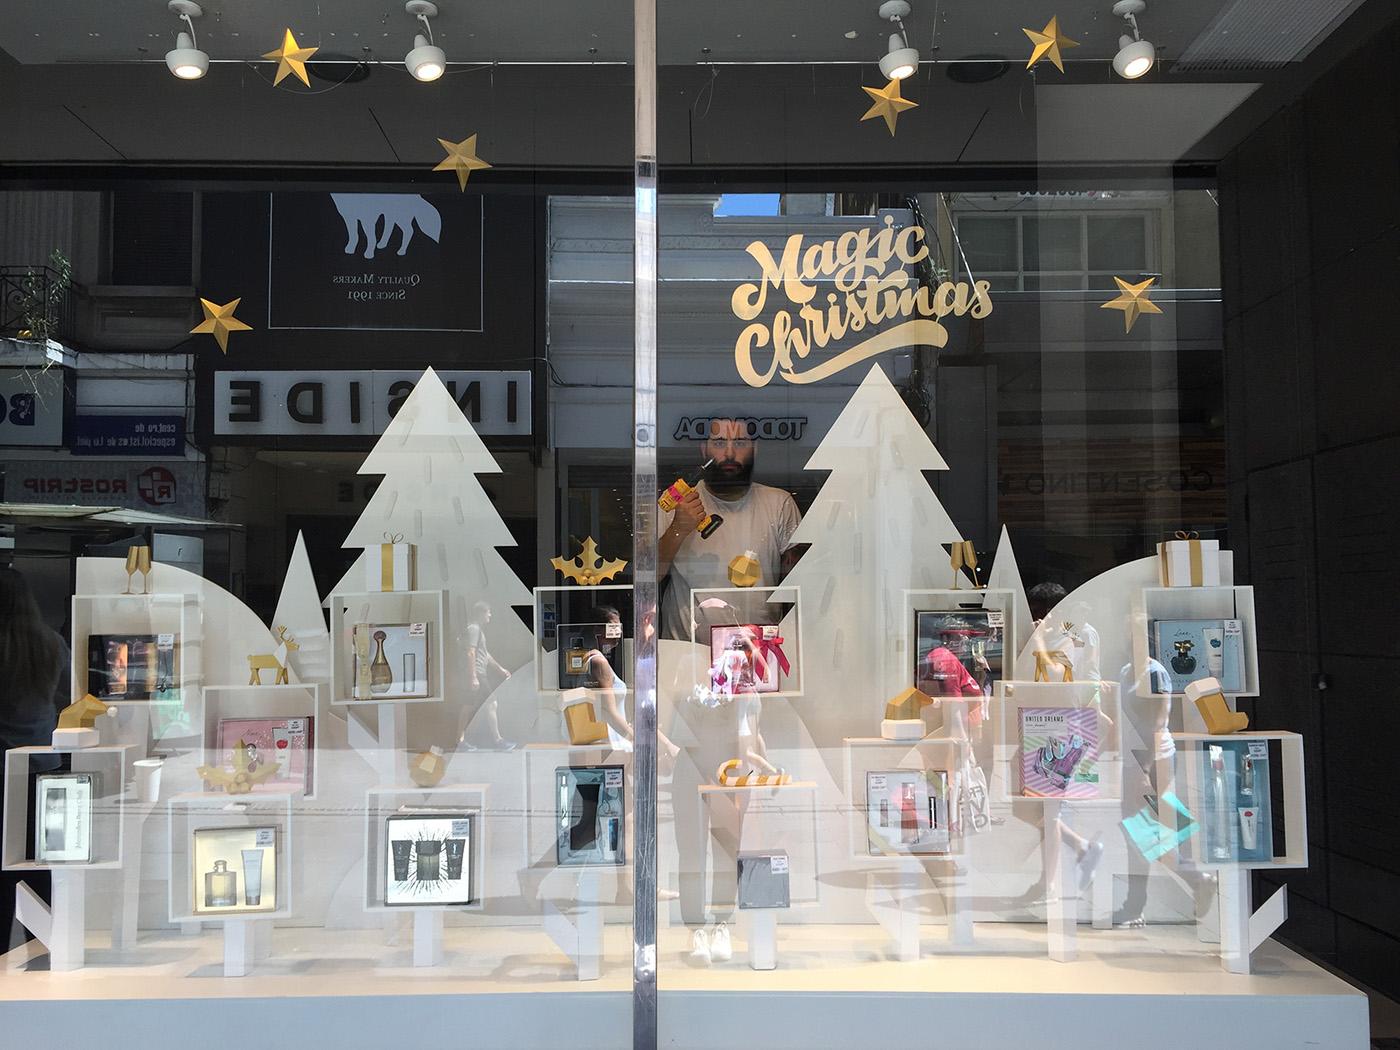 lowpoly papercraft Window Display vidriera escaparate navidad Christmas xmas White and gold juleriaque